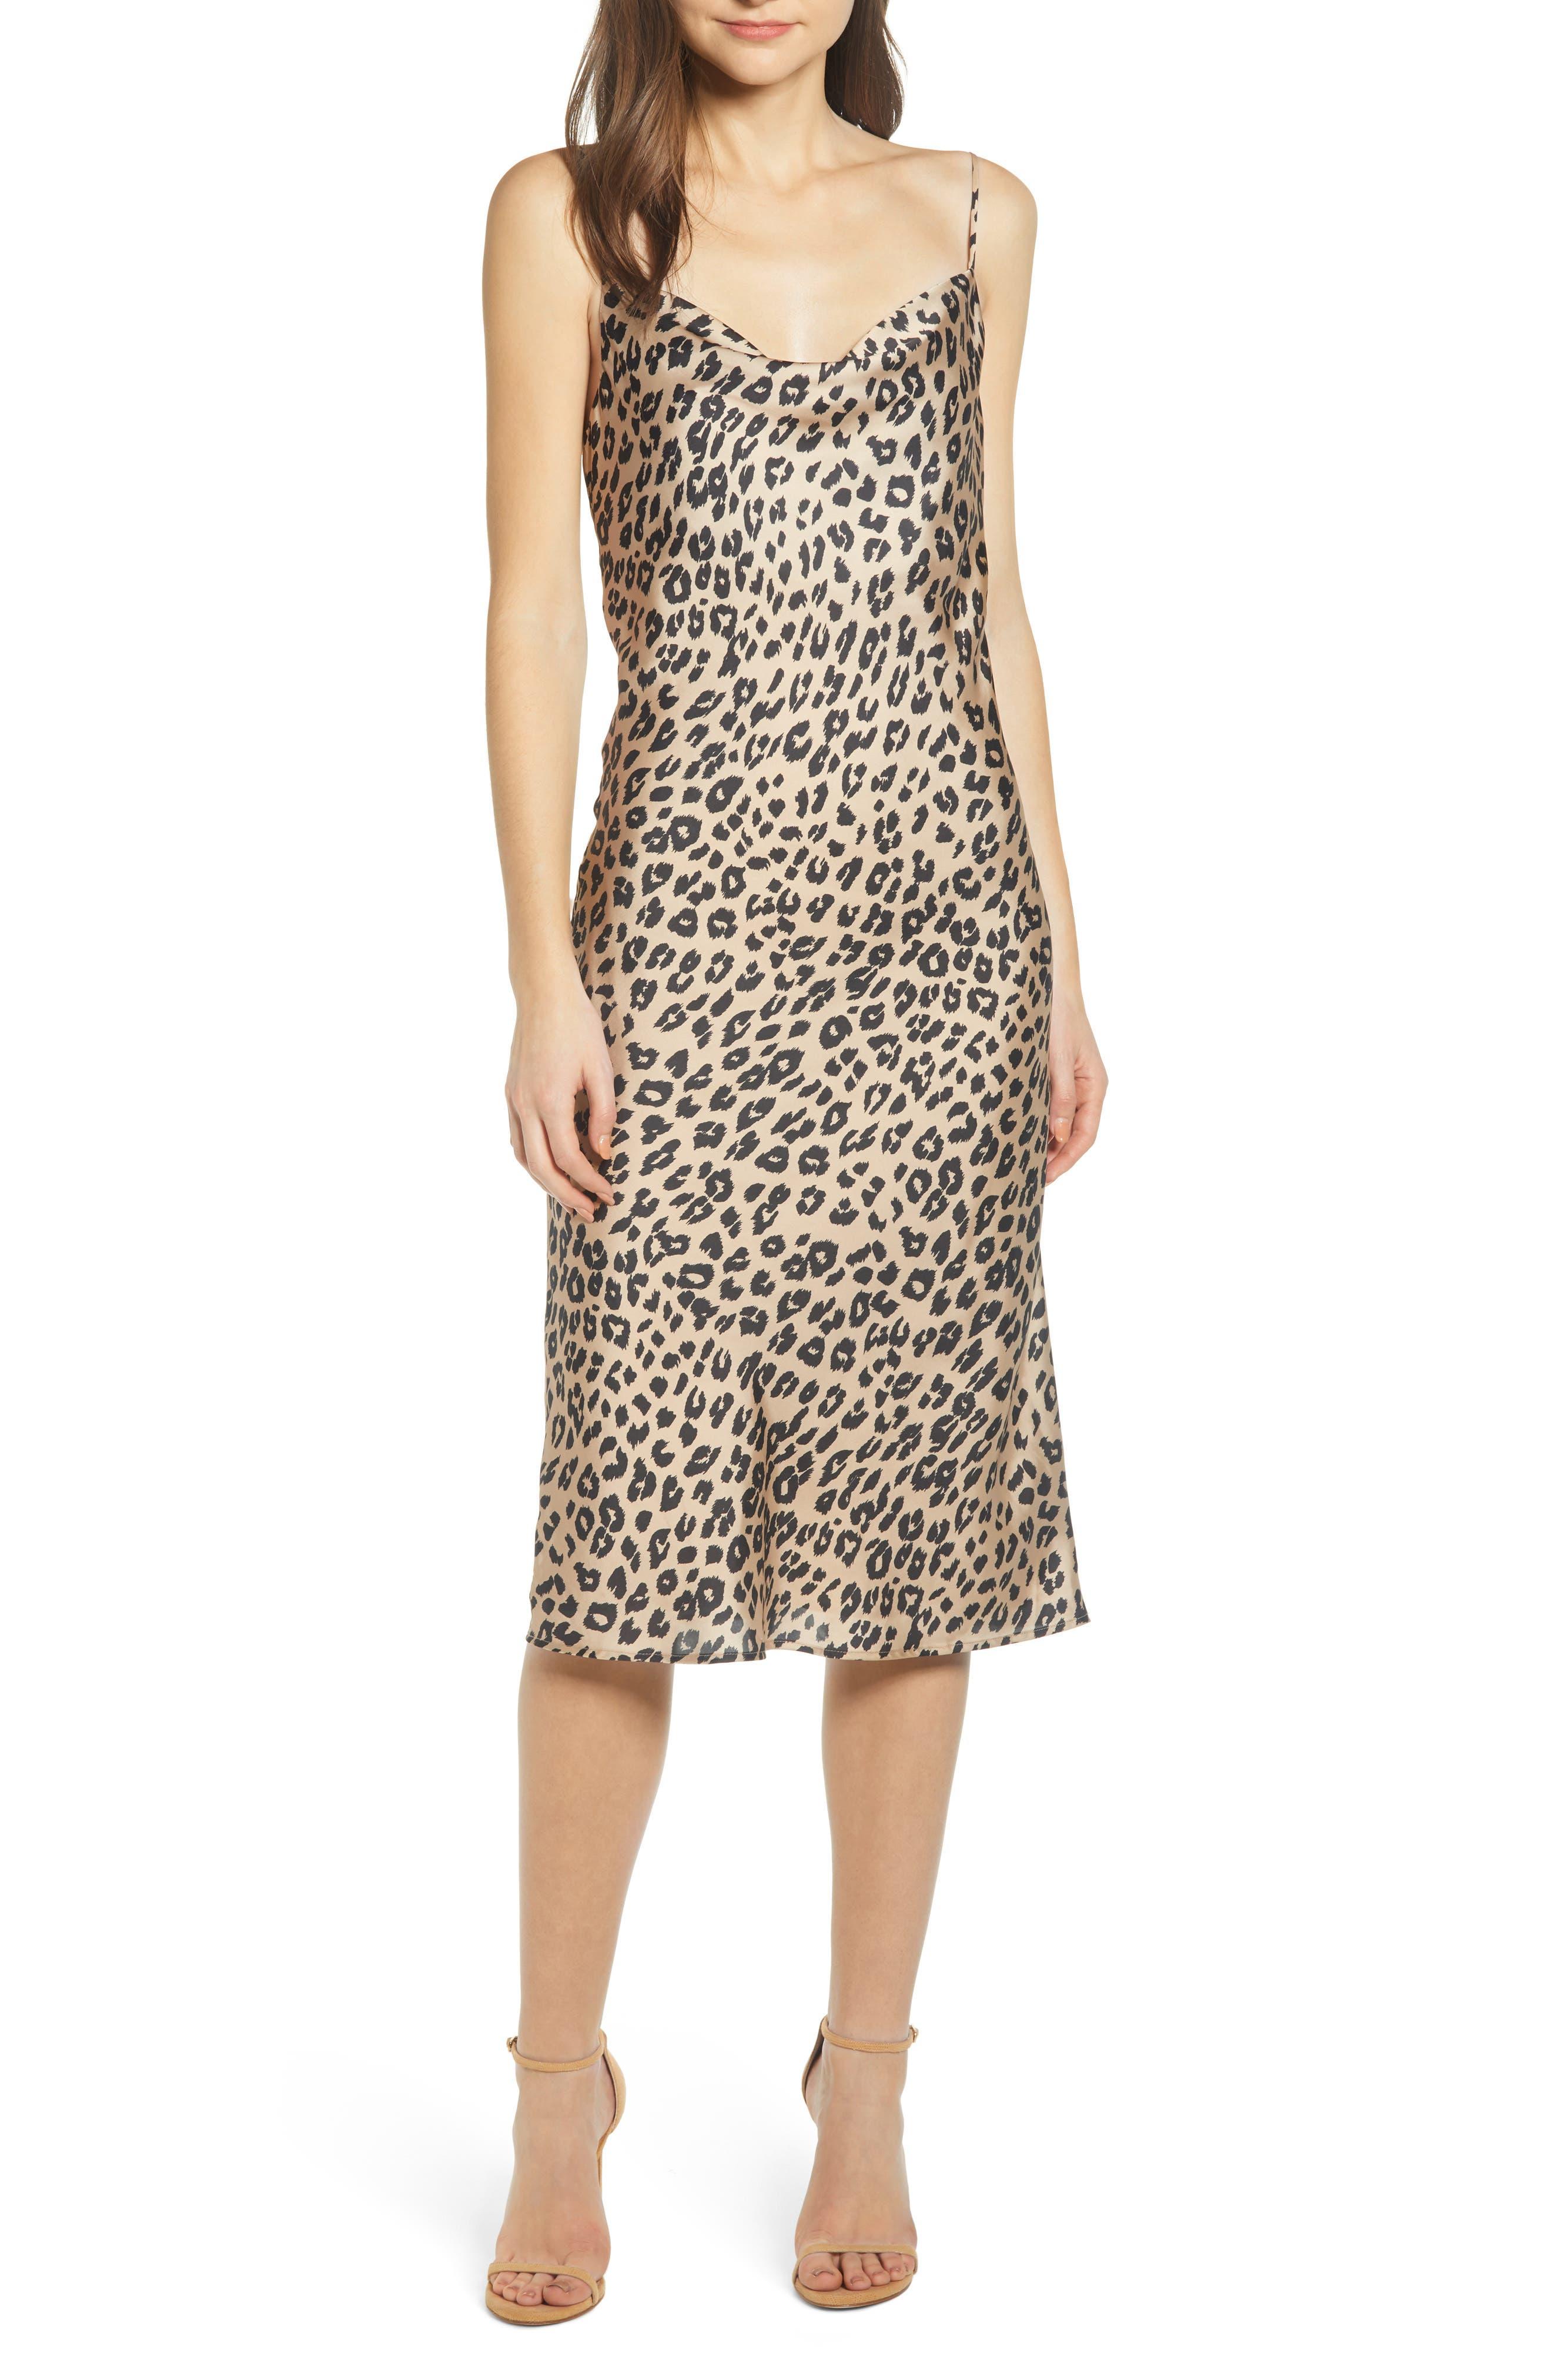 Bardot Leopard Cocktail Slipdress, Beige